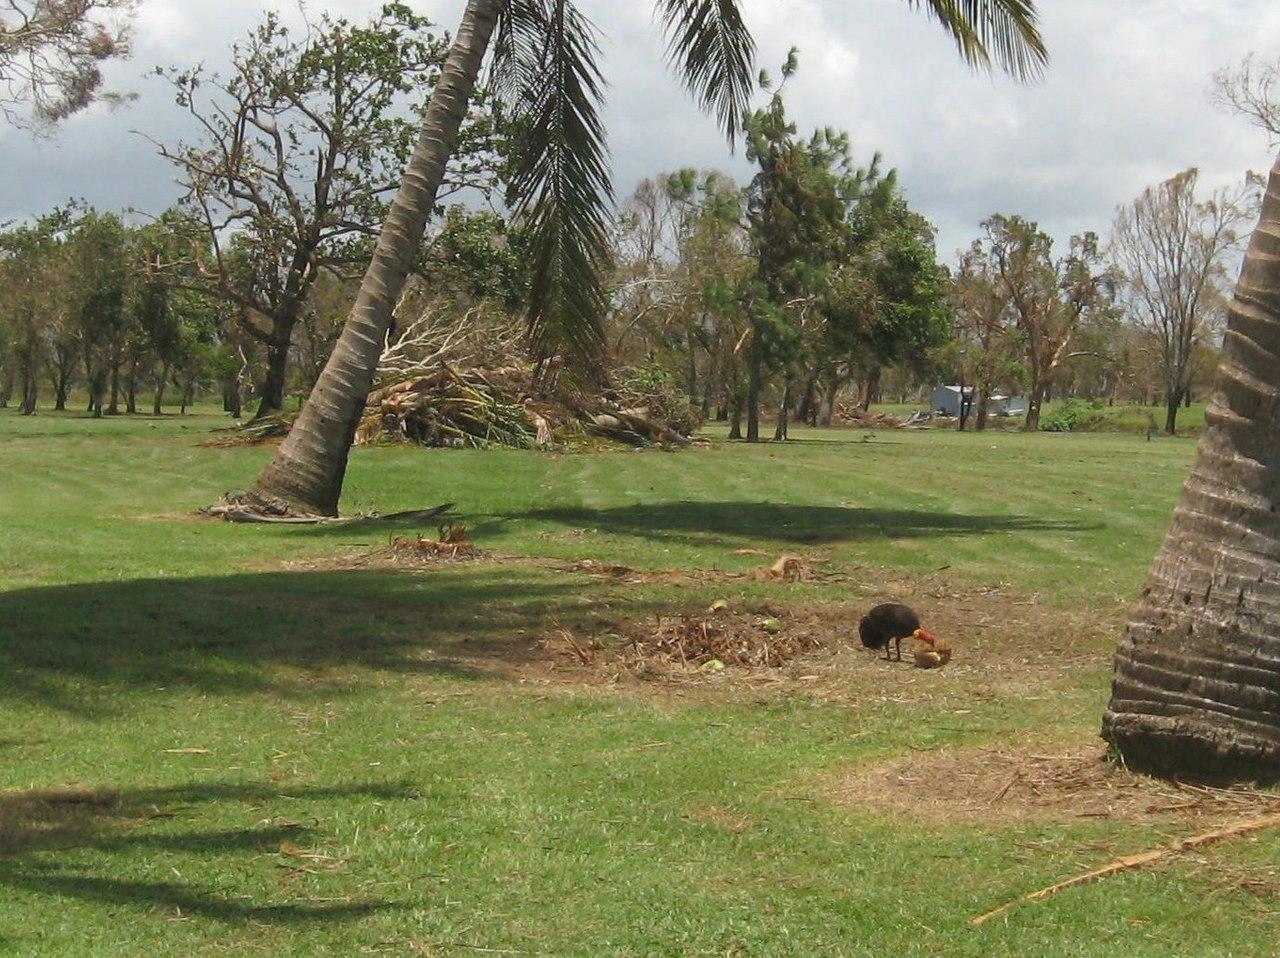 File:Australian Brush Turkey (Alectura lathami) having a feed of coconut. Feb 2011 - panoramio.jpg